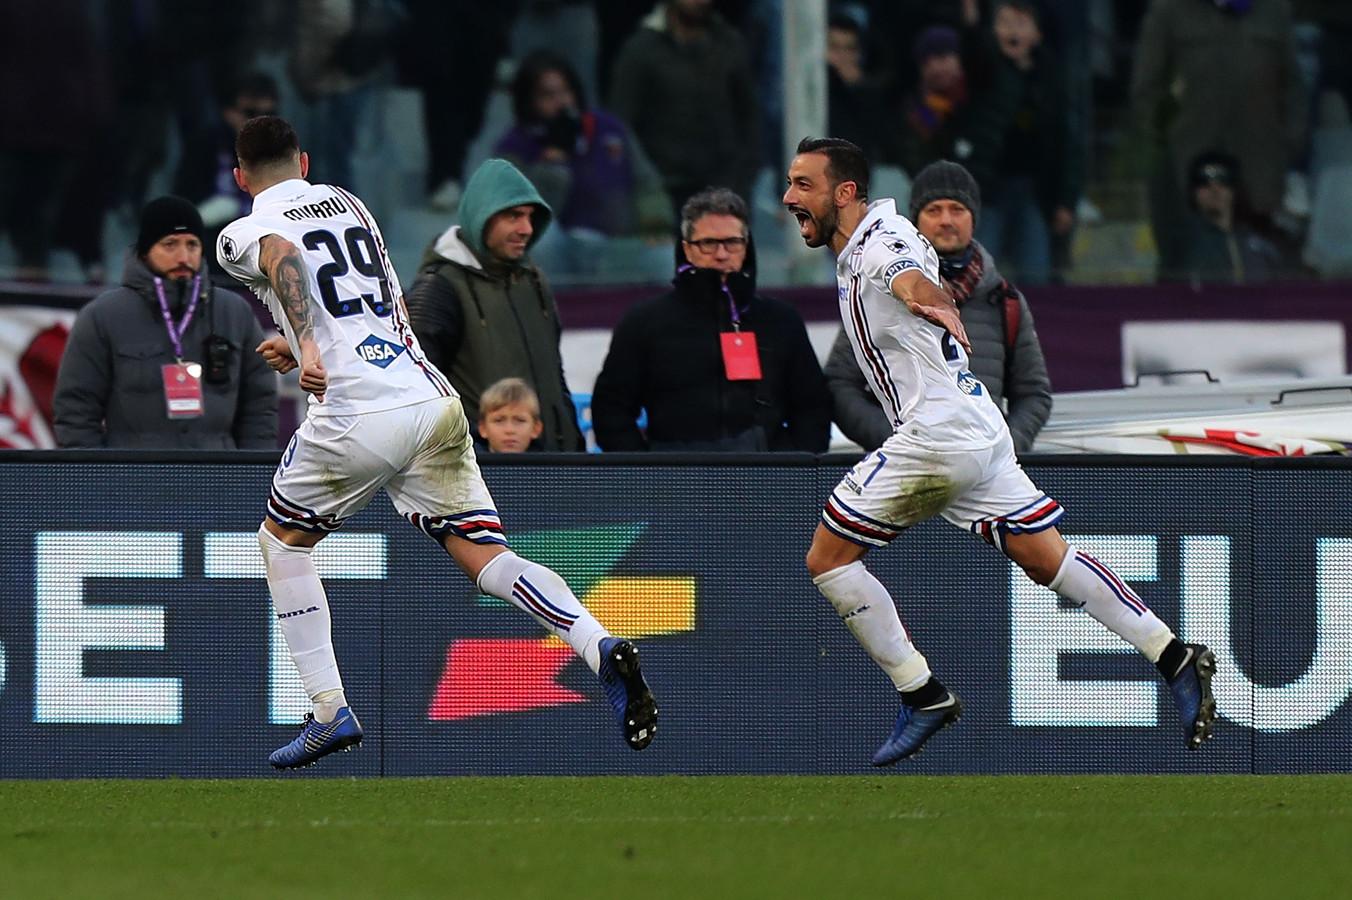 Fabio Quagliarella viert zijn derde goal.